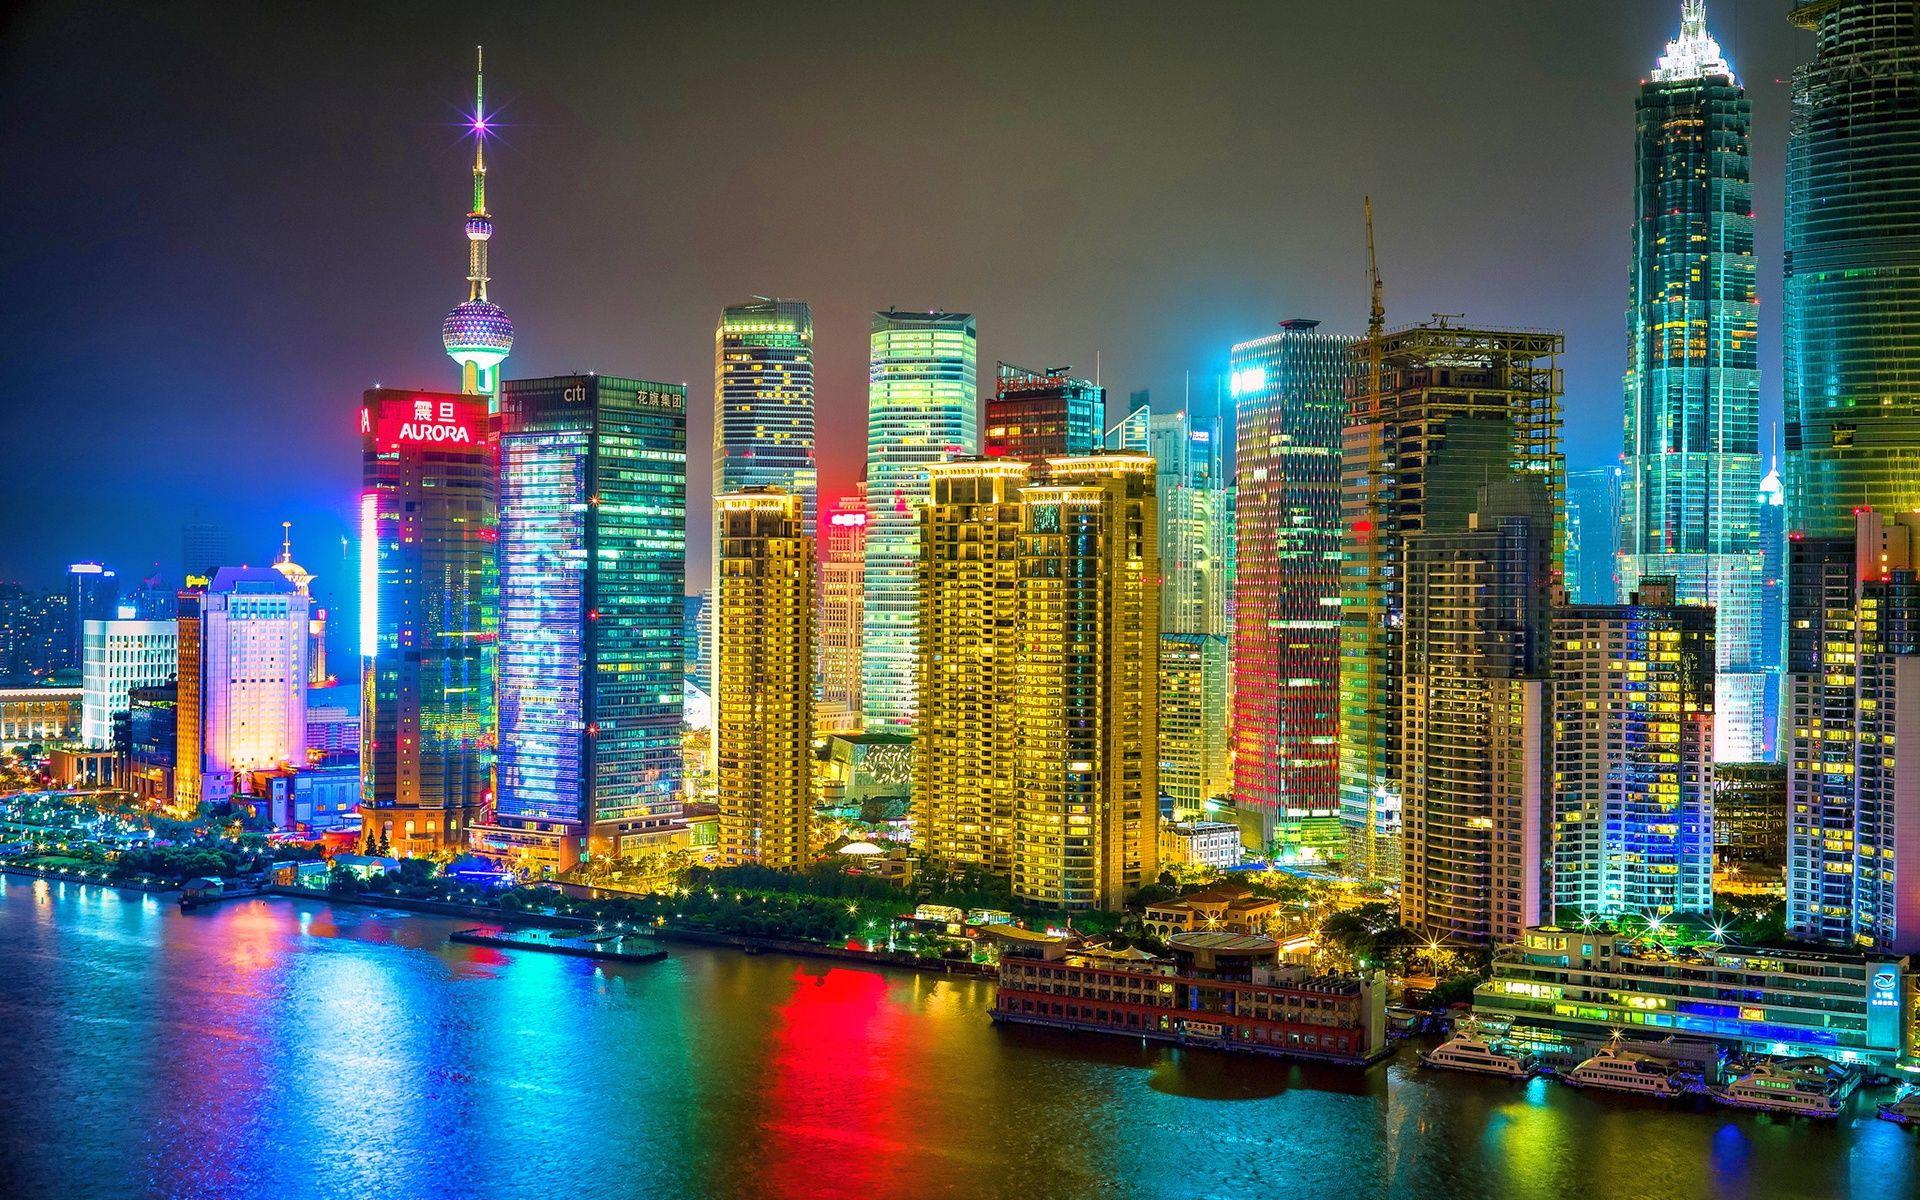 Colorful Shanghai City Night Hd Wallpaper Fotos 1080p Cercas